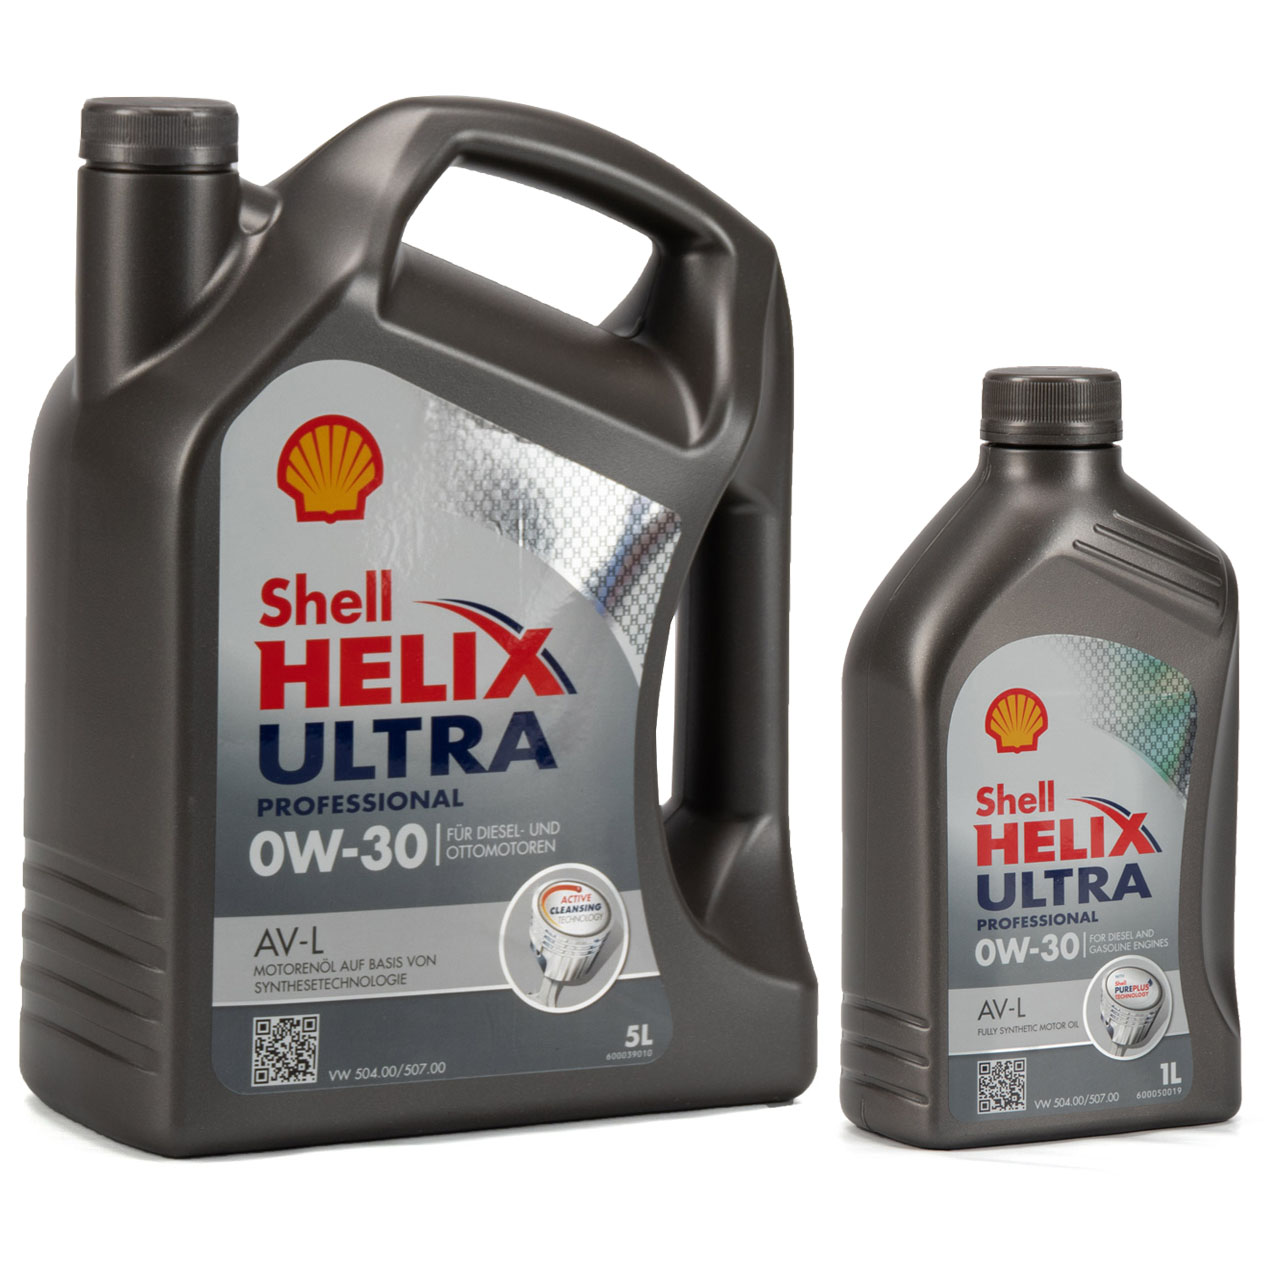 SHELL Motoröl Öl HELIX ULTRA Professional AV-L 0W30 VW 504.00/507.00 - 6 Liter